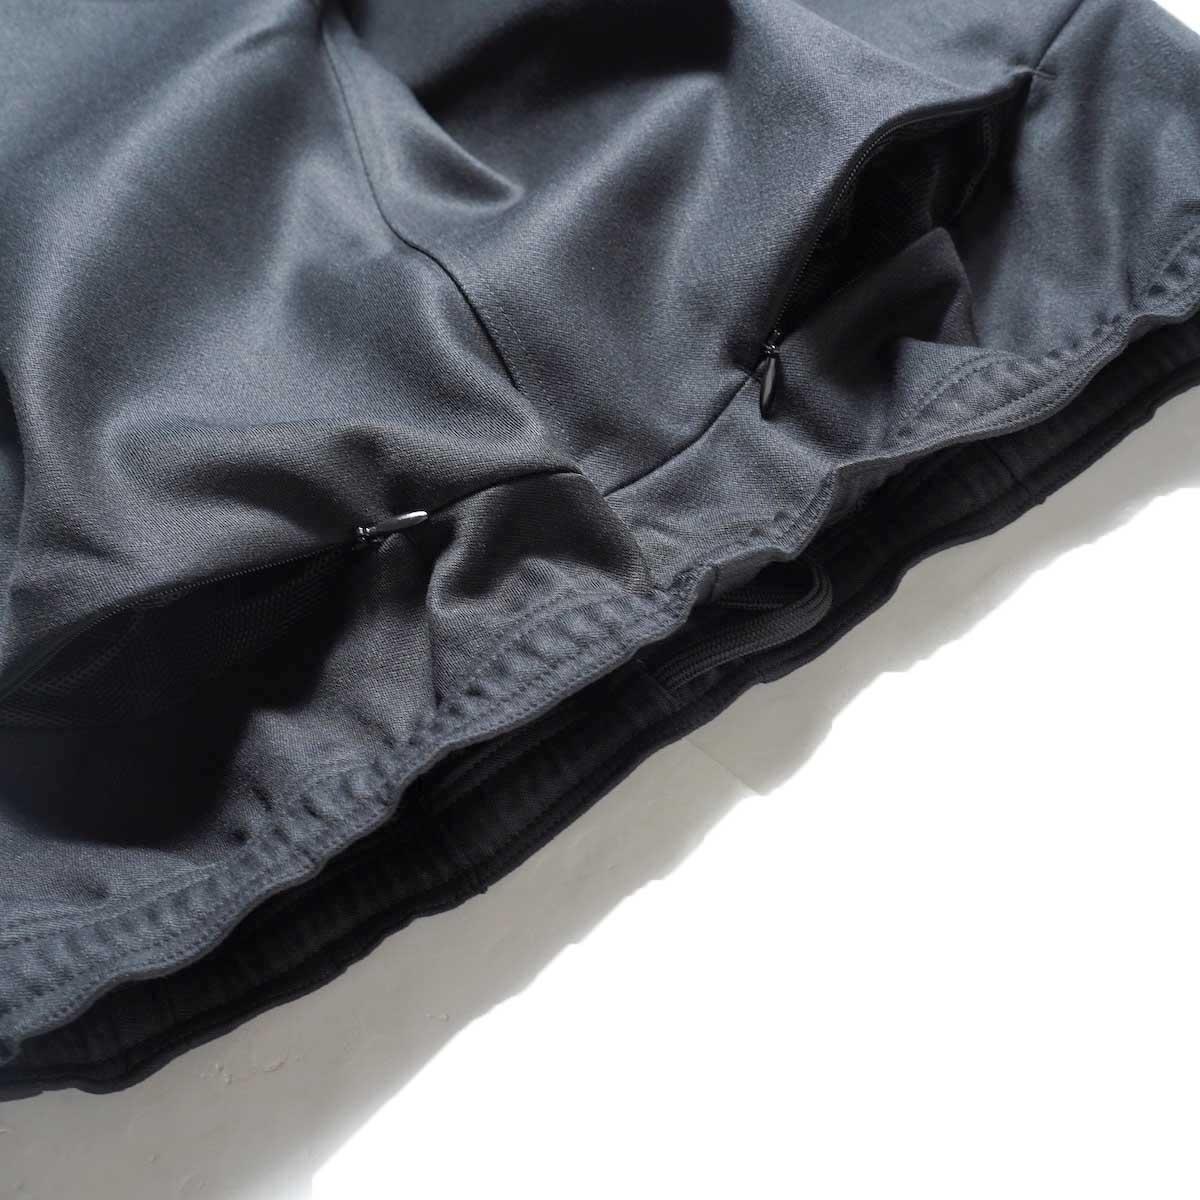 Needles / W.U. BOOT-CUT PANT - PE/R DOESKIN (Black)ヒップポケット2